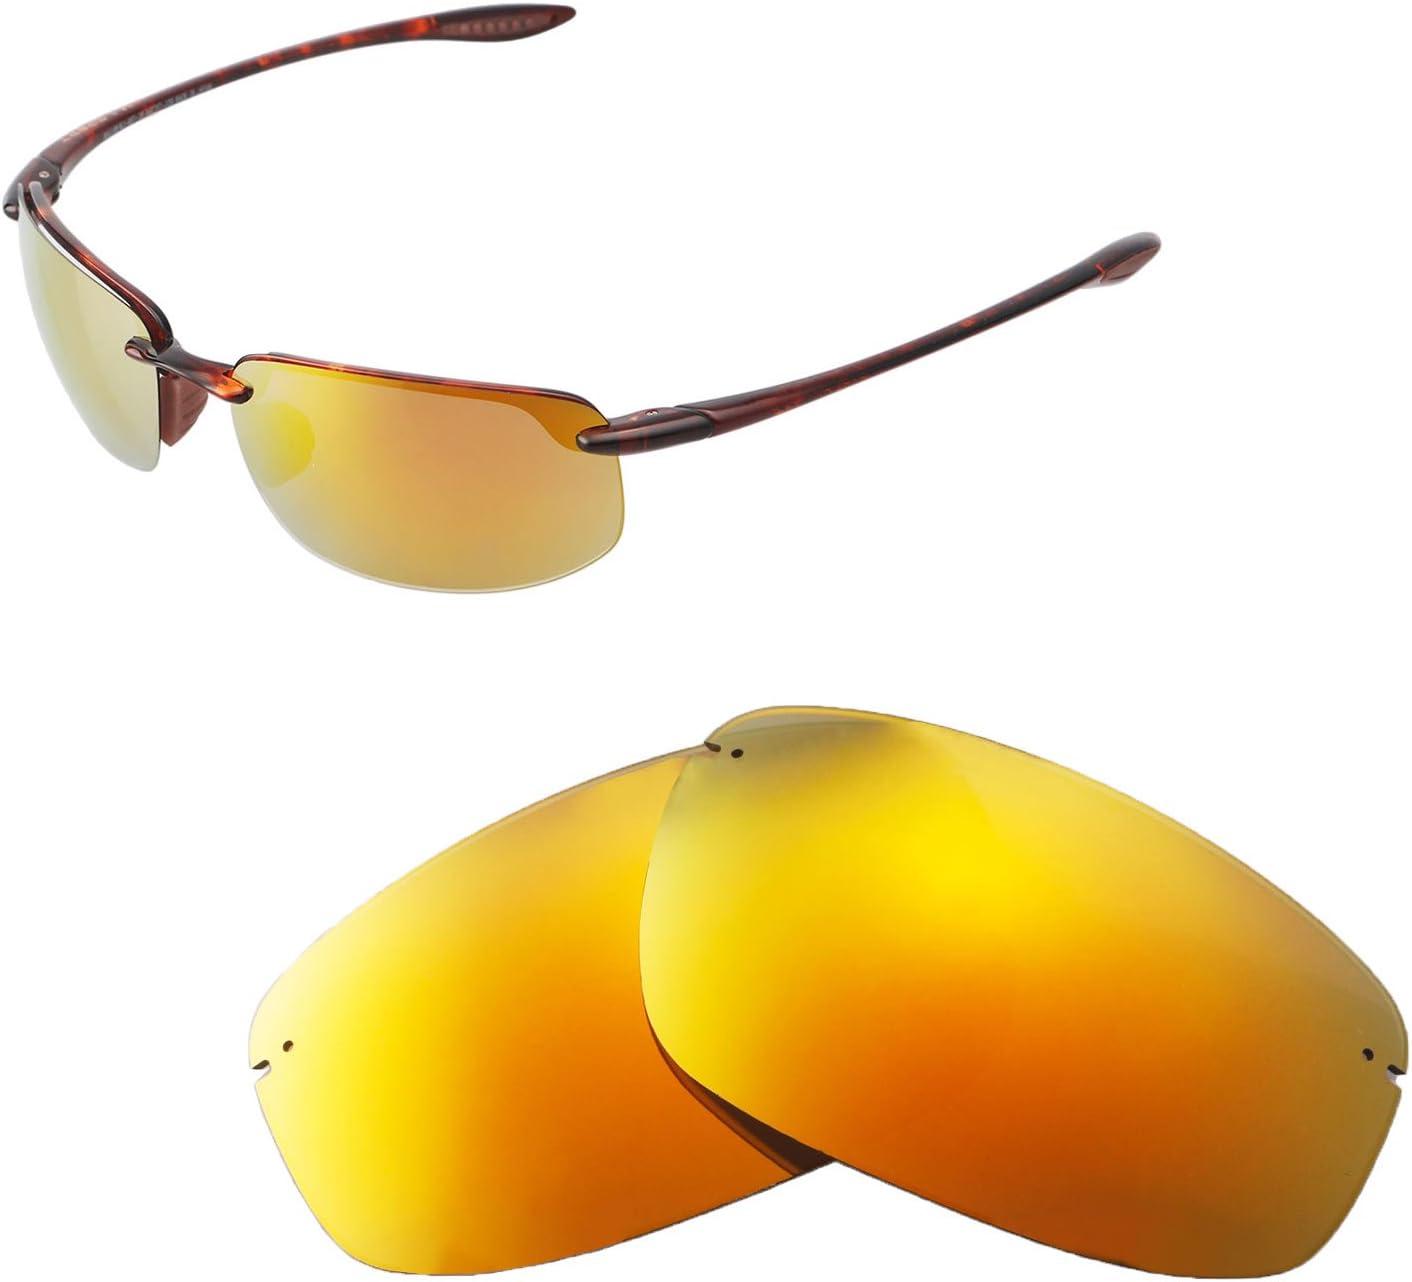 SFX Replacement Sunglass Lenses fits Maui Jim Kipahulu MJ279 59mm Wide